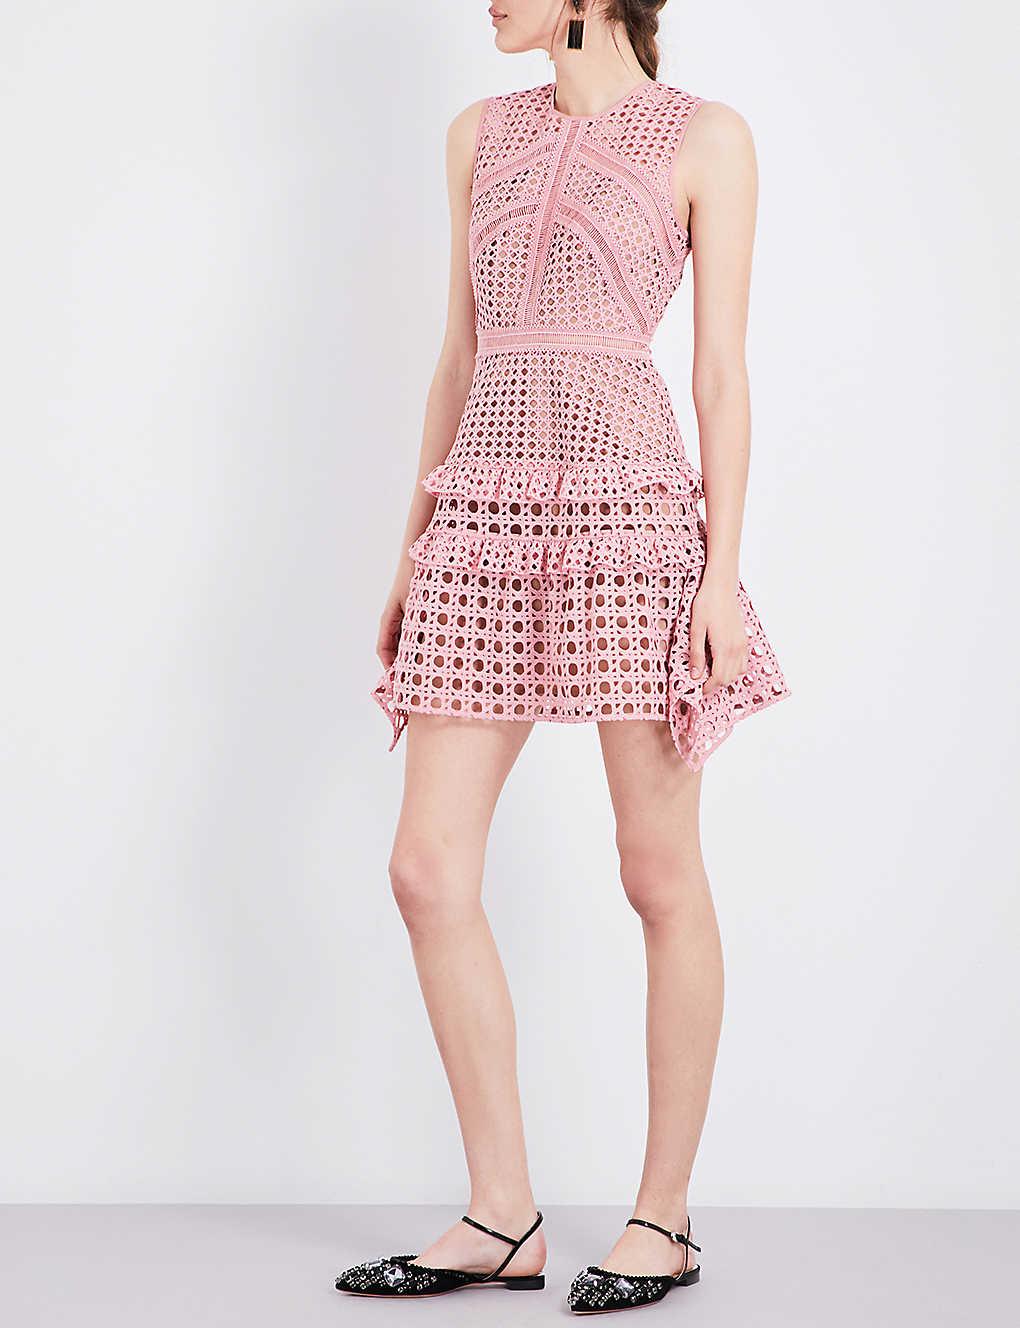 Christmas dress attire for age 57 - Self Portrait Frilled Lace Mini Dress